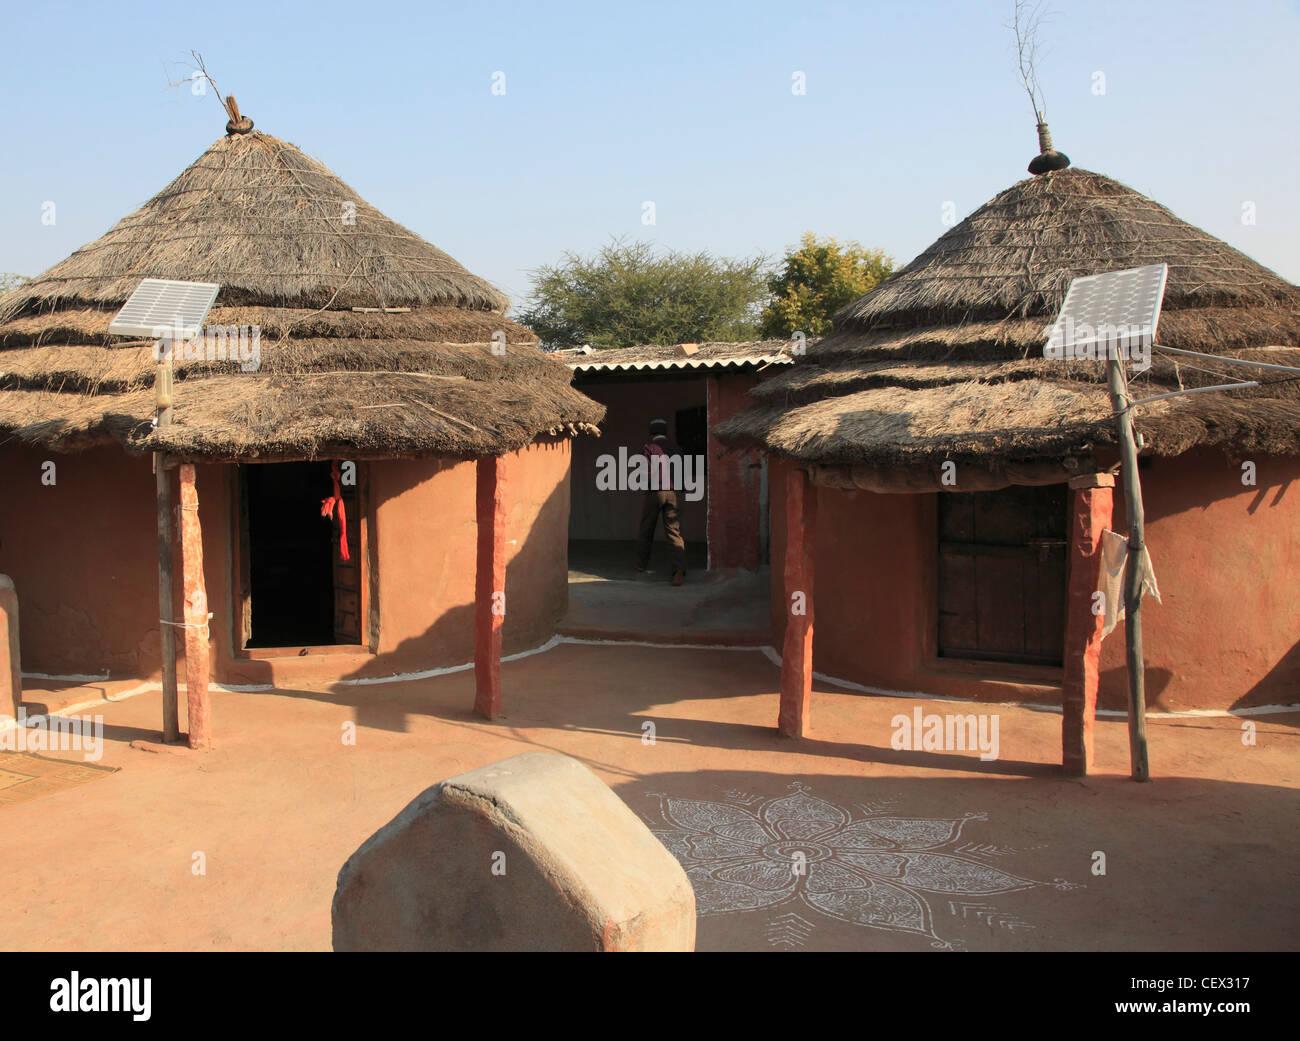 India Rajasthan Jodhpur Rural Houses With Solar Panels